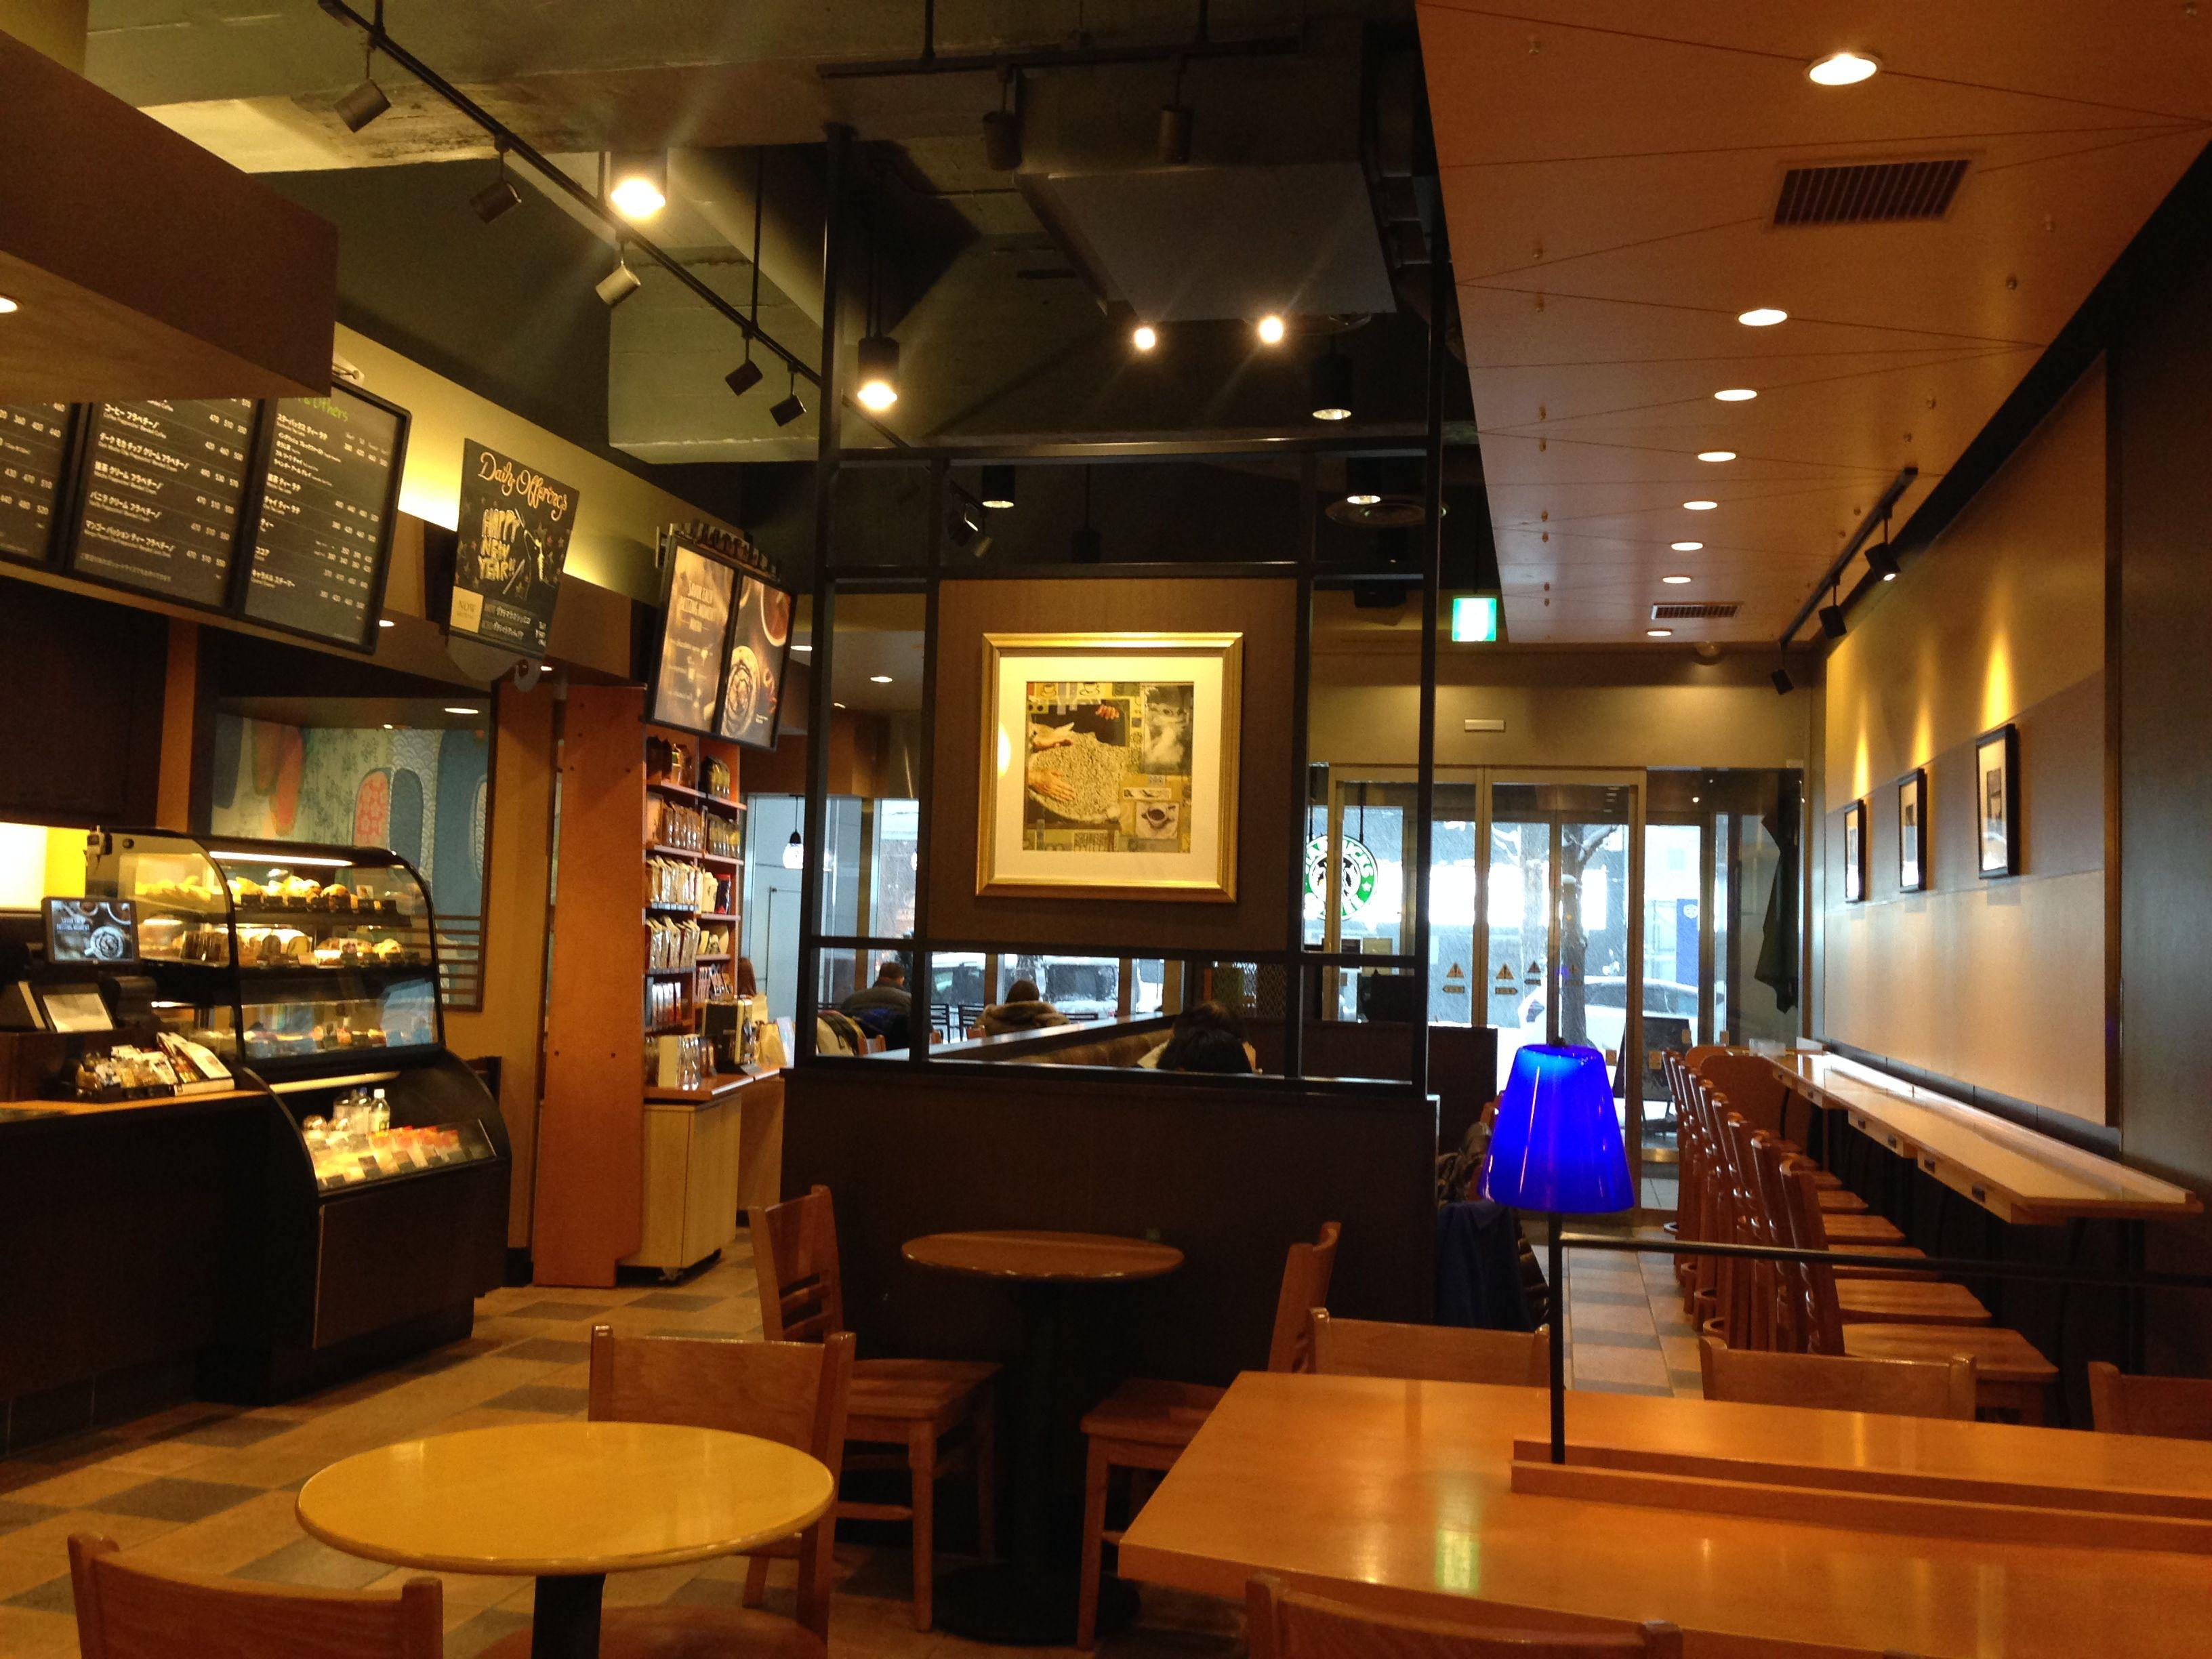 Quiet moment on New Year's Day at Ichijyo Starbucks, Sapporo